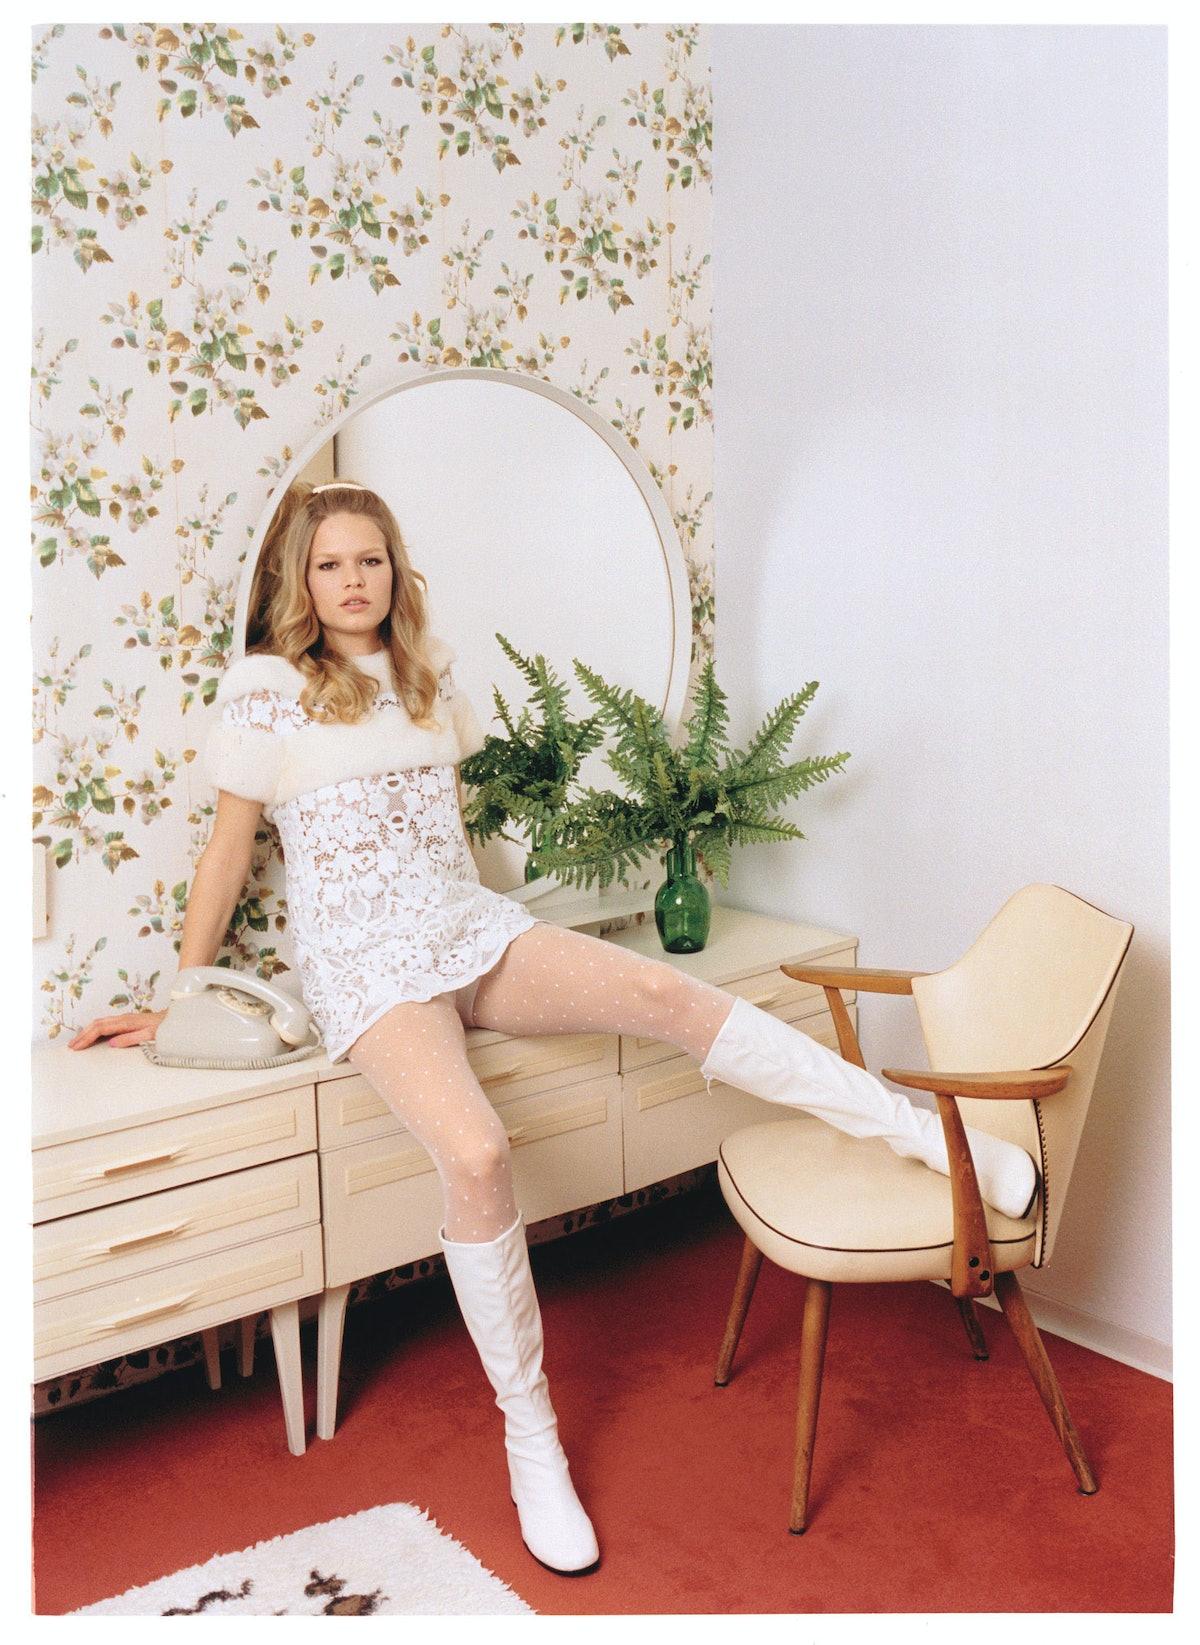 anna-ewers-2-white-mood